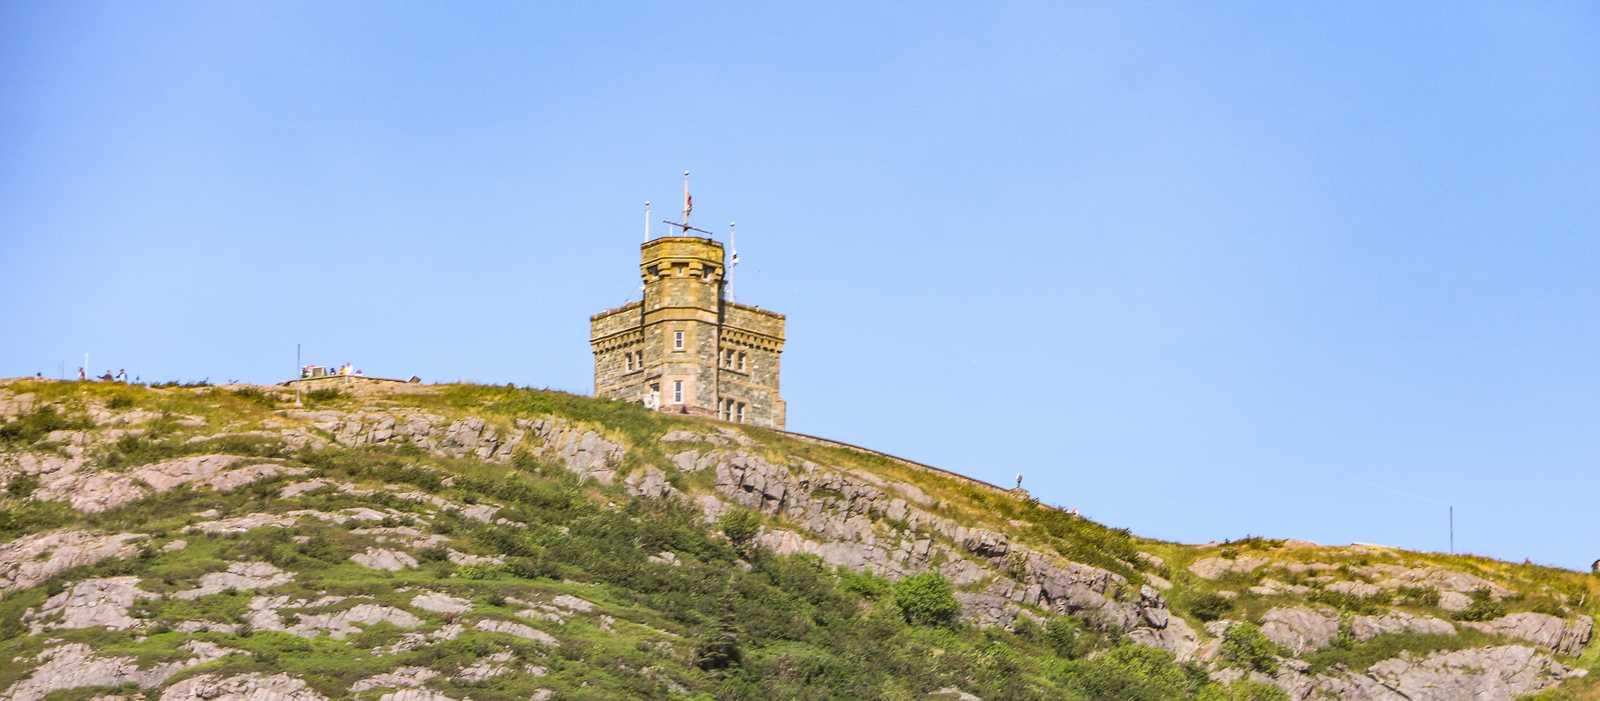 Signal Hill in St. John's